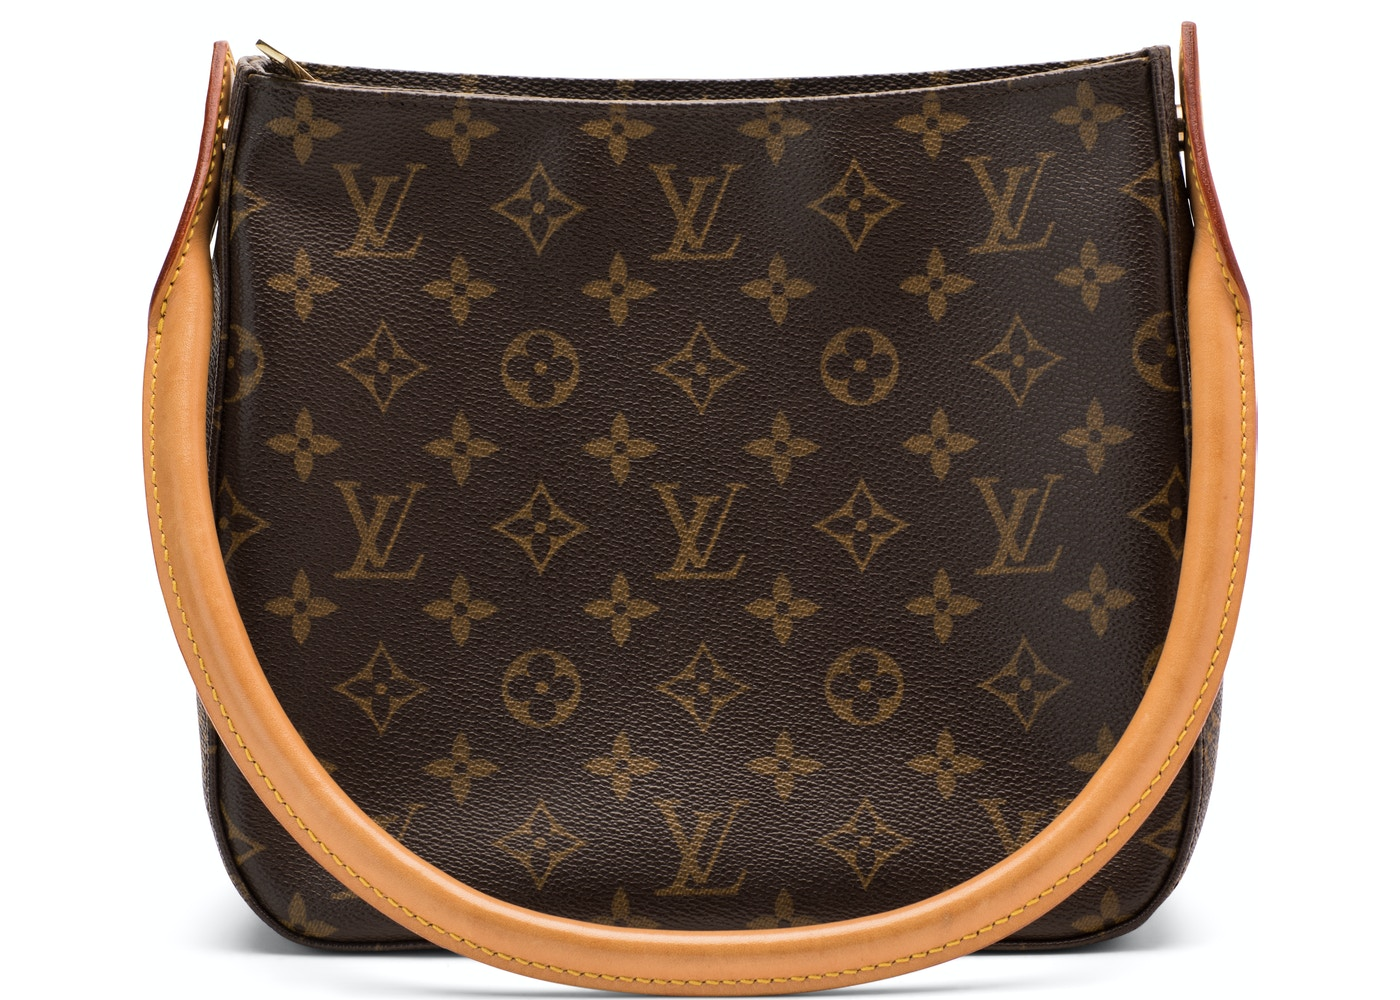 8c3026fcb0d5 Louis Vuitton Looping Monogram MM Brown. Monogram MM Brown